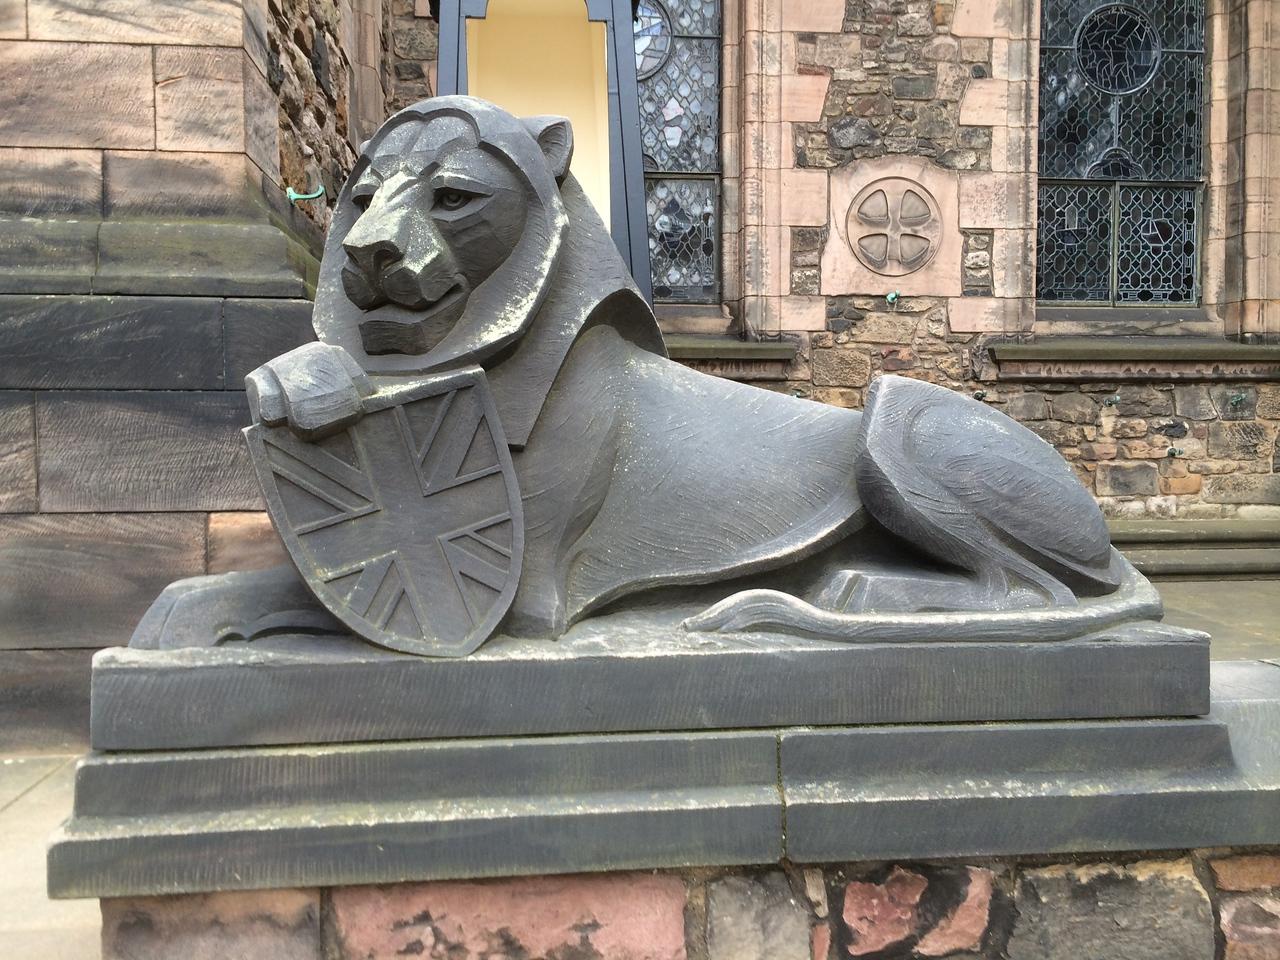 The lion guarding the war memorial